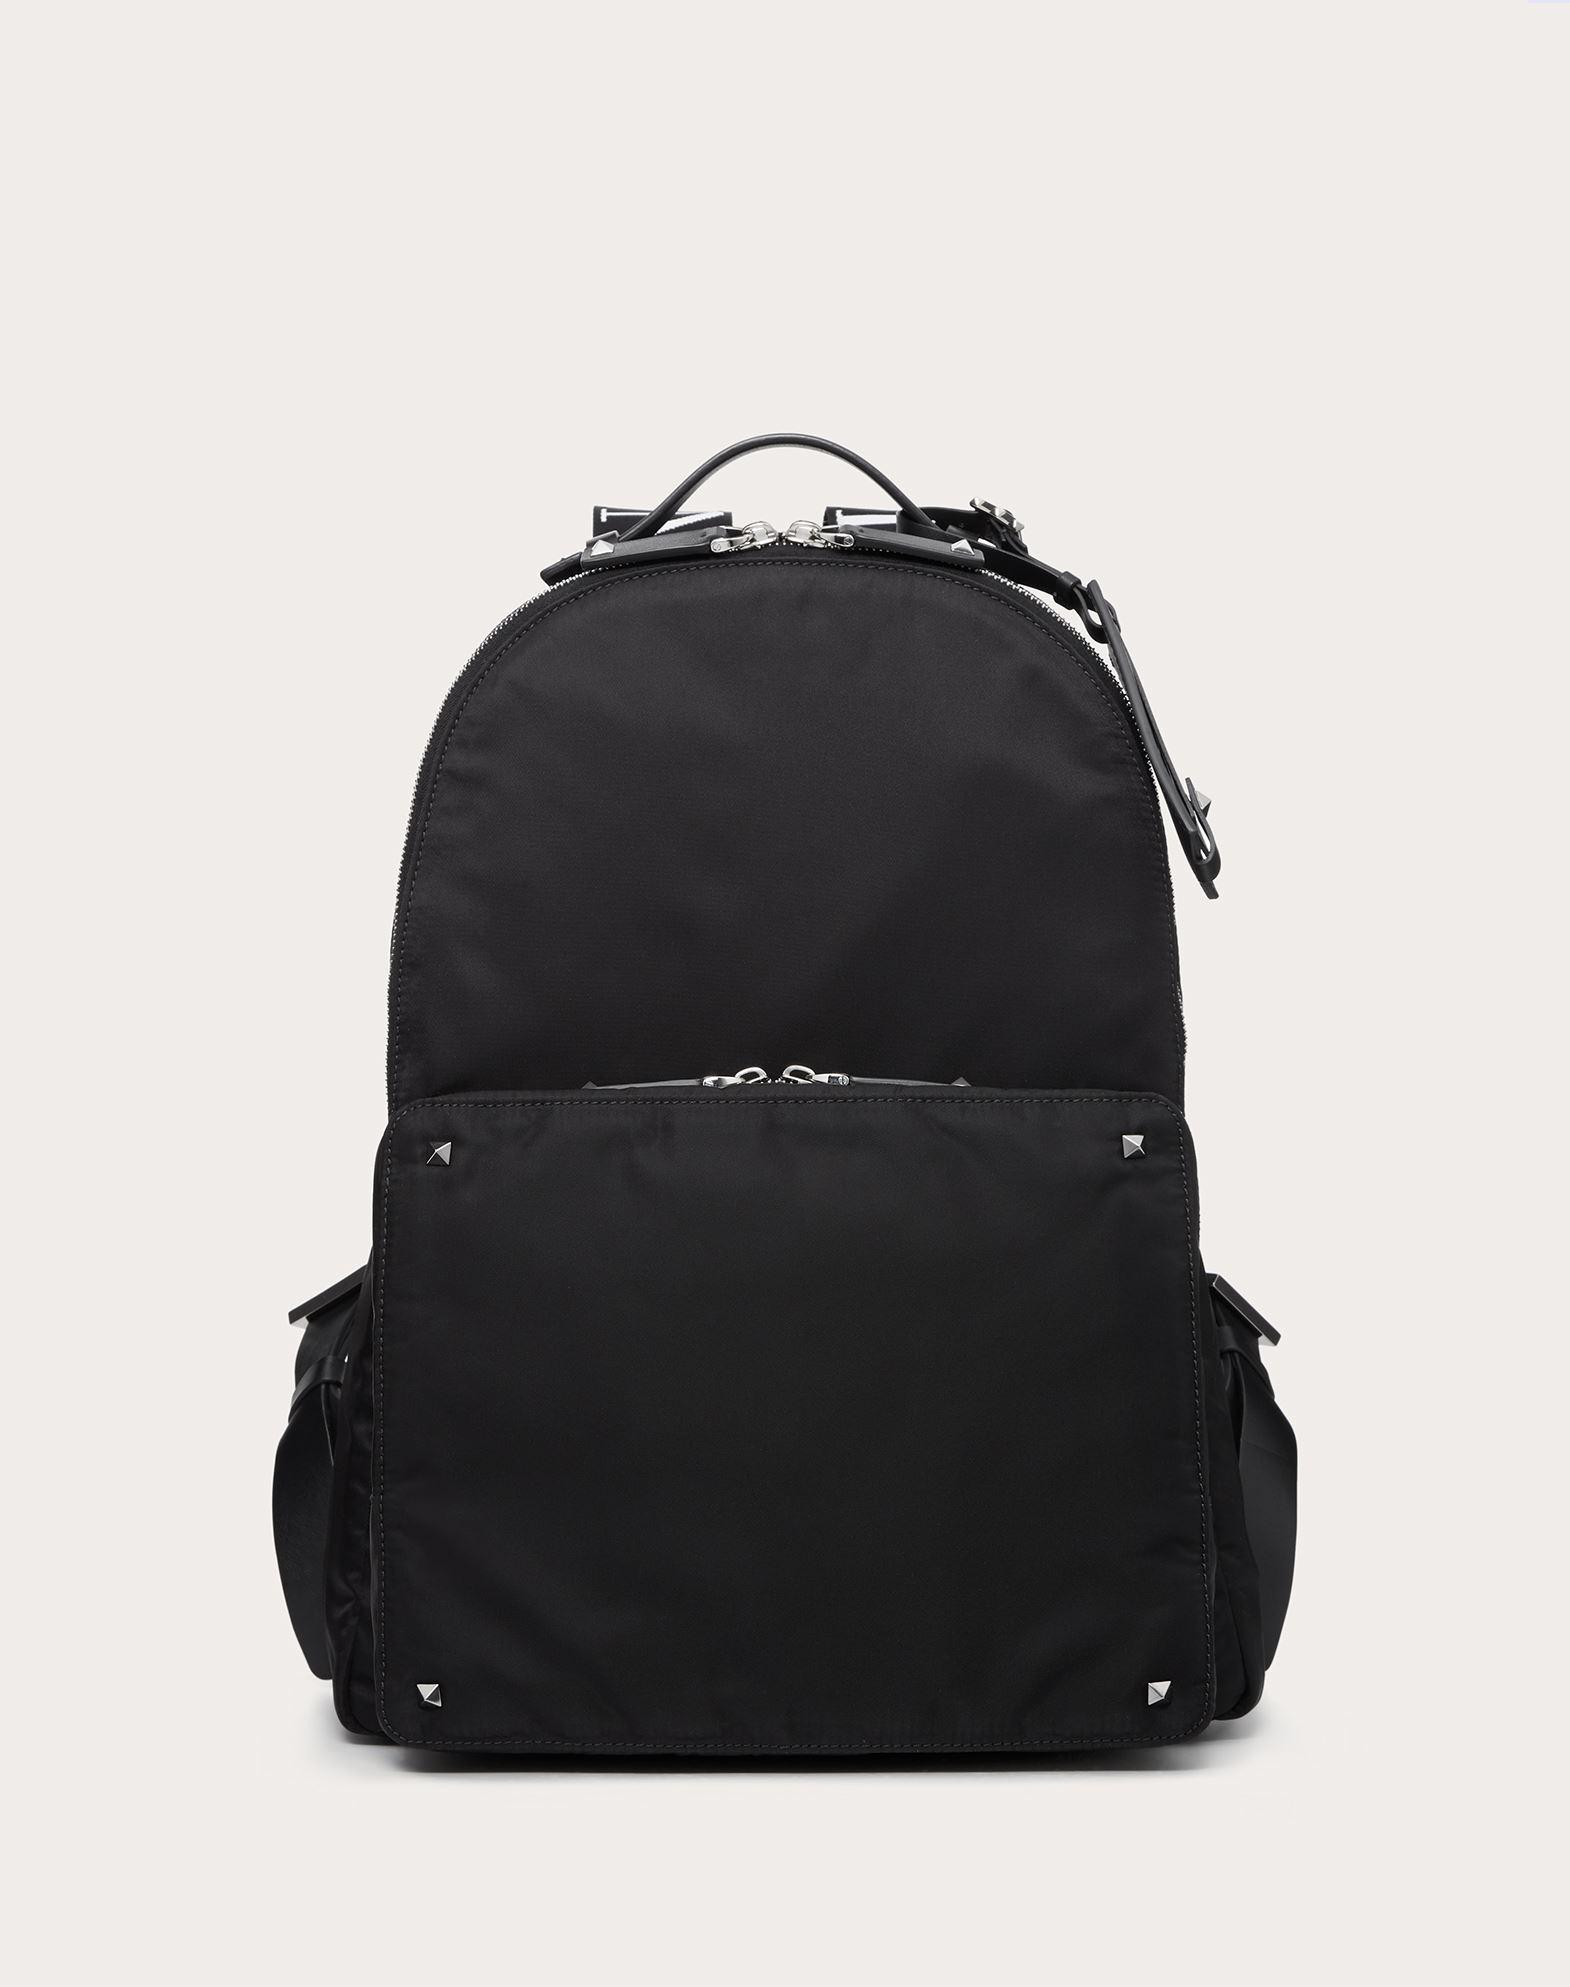 VALENTINO GARAVANI UOMO VLTN backpack Rucksack U f